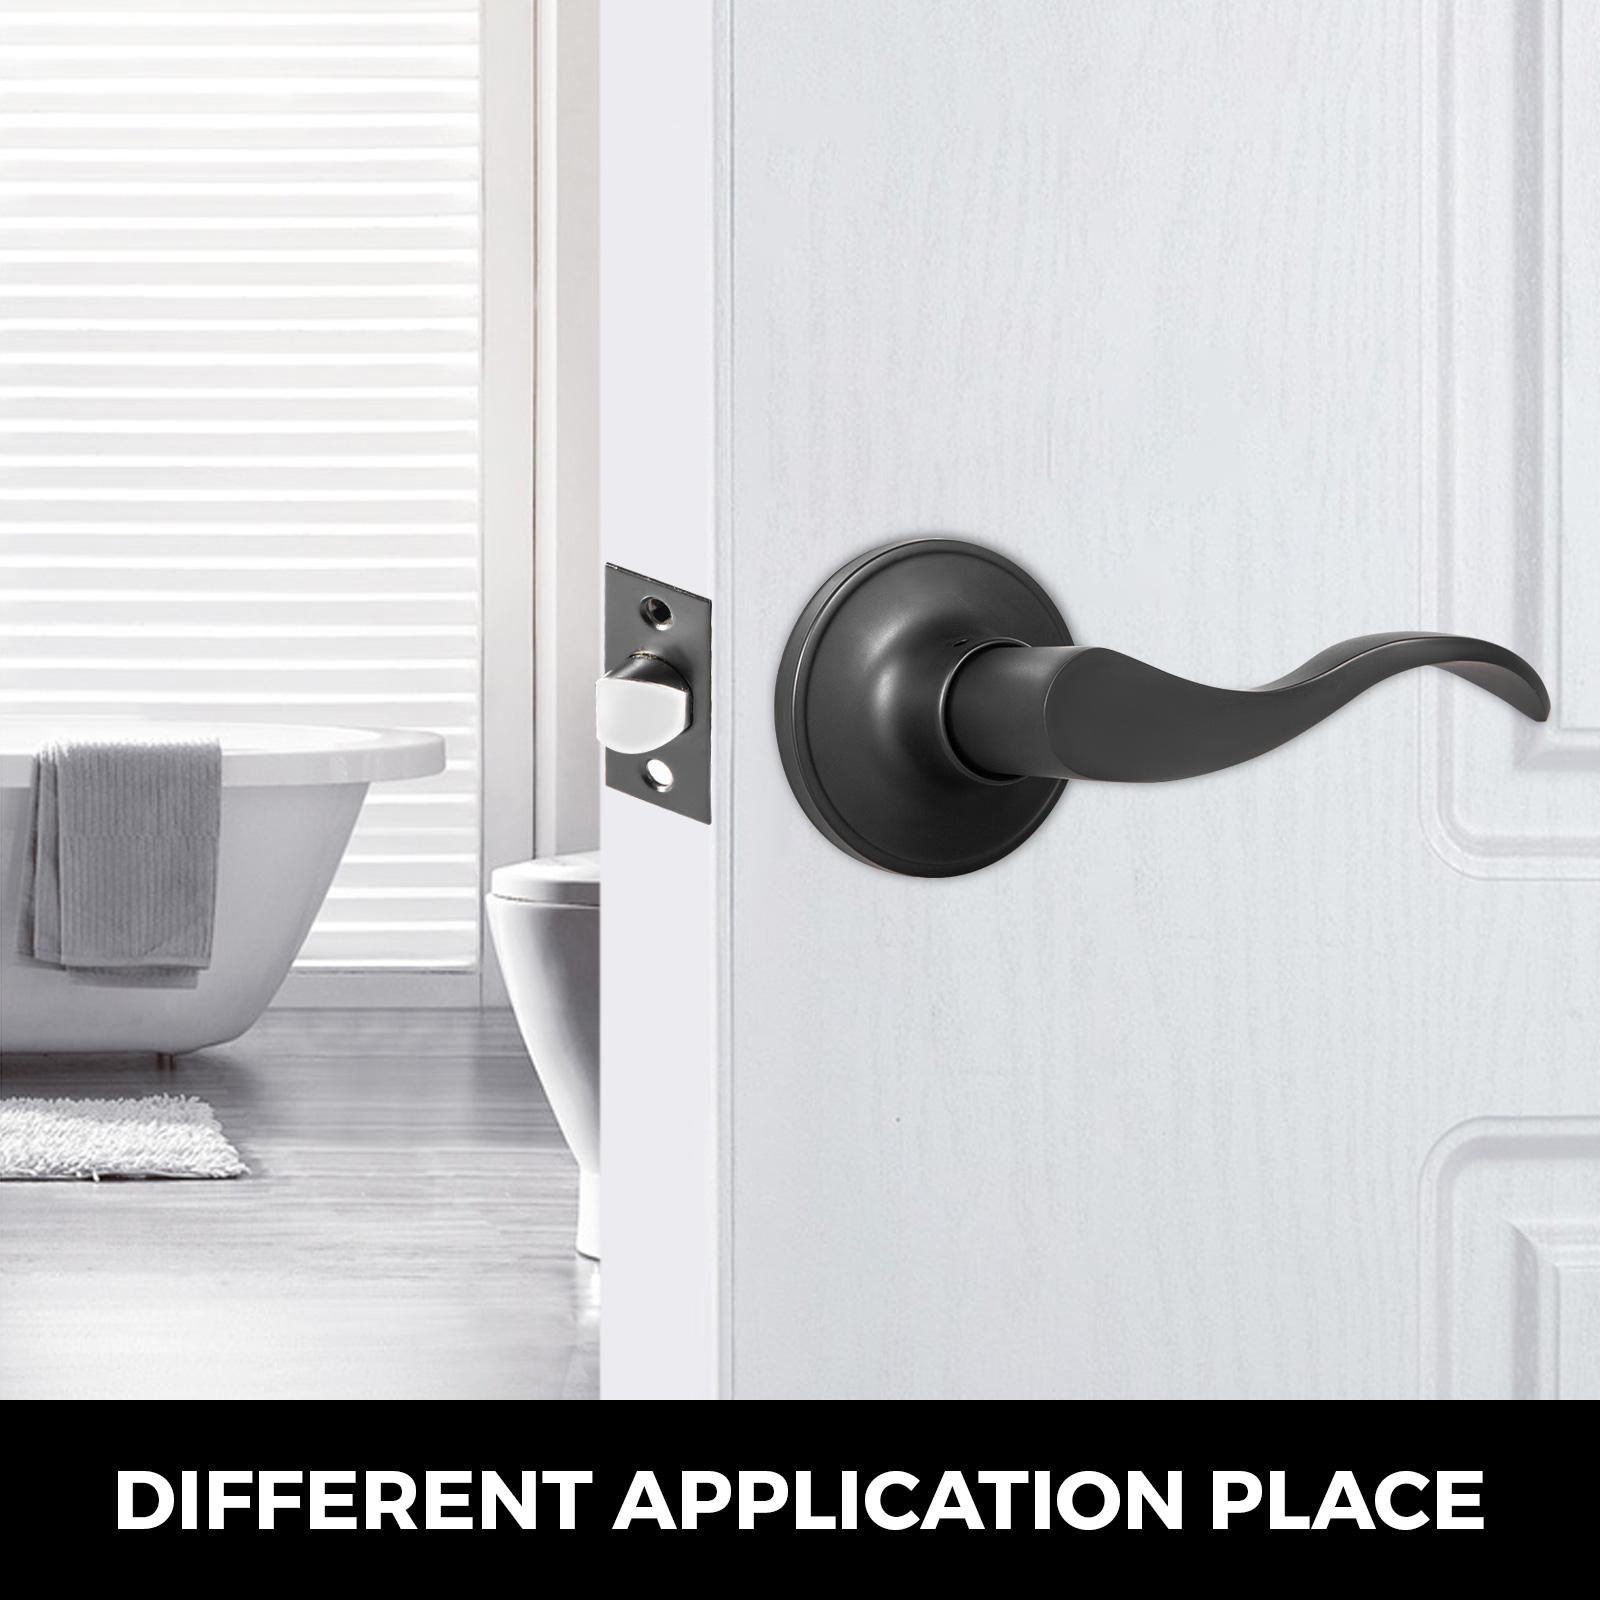 Door-Handles-Matte-Black-Door-Lever-3-5-10-Pack-Passage-Privace-Entry-Lock-Set thumbnail 39